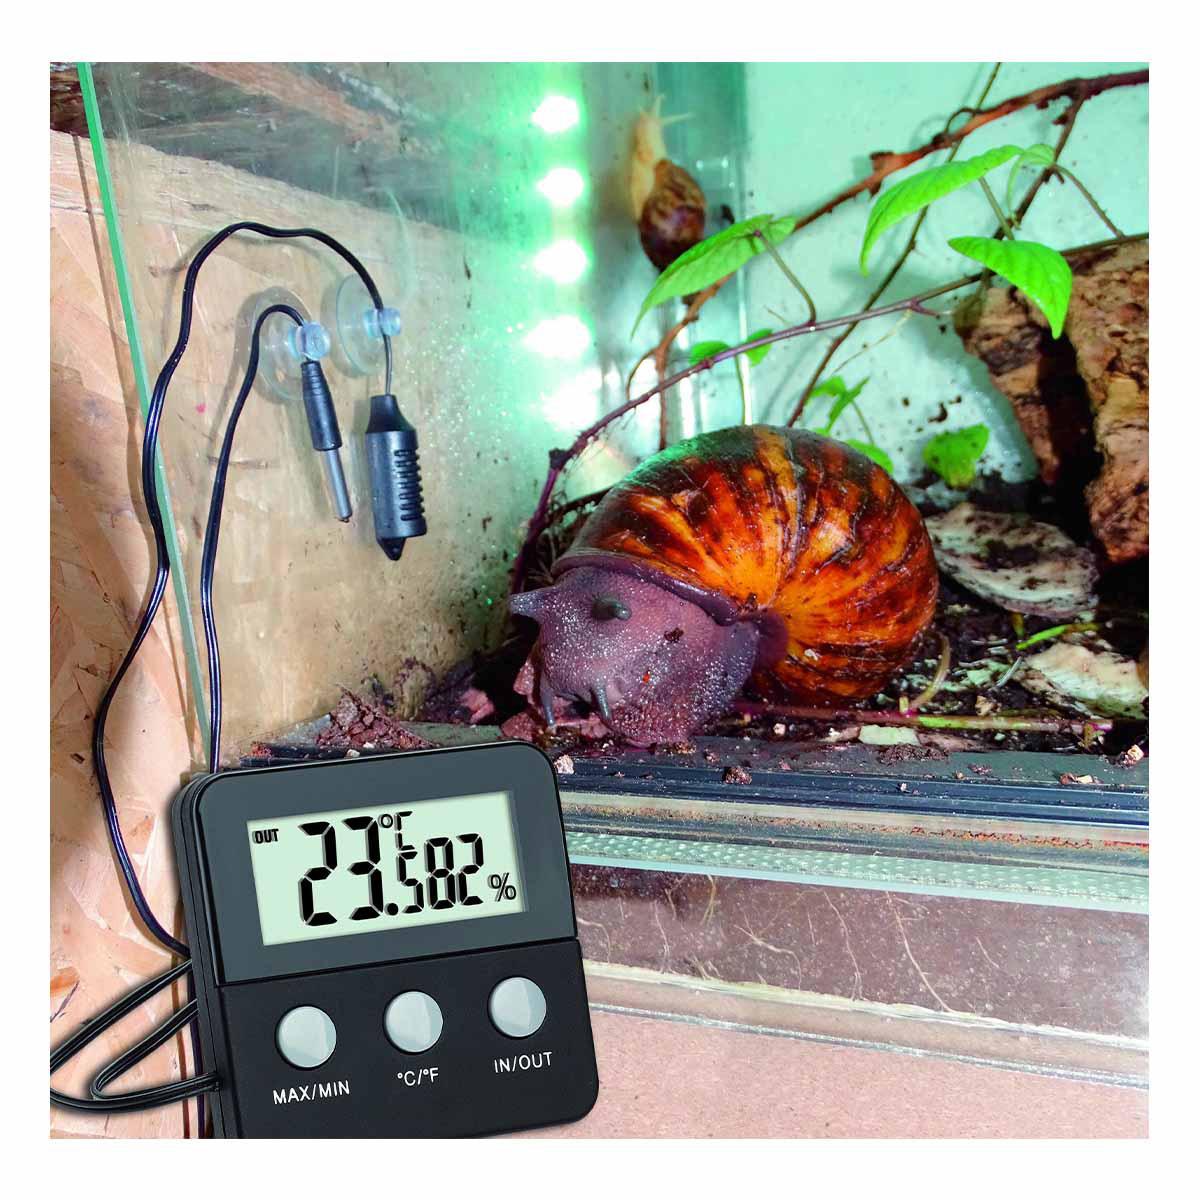 30-5044-01-digitales-thermo-hygrometer-terracheck-anwendung-1200x1200px.jpg